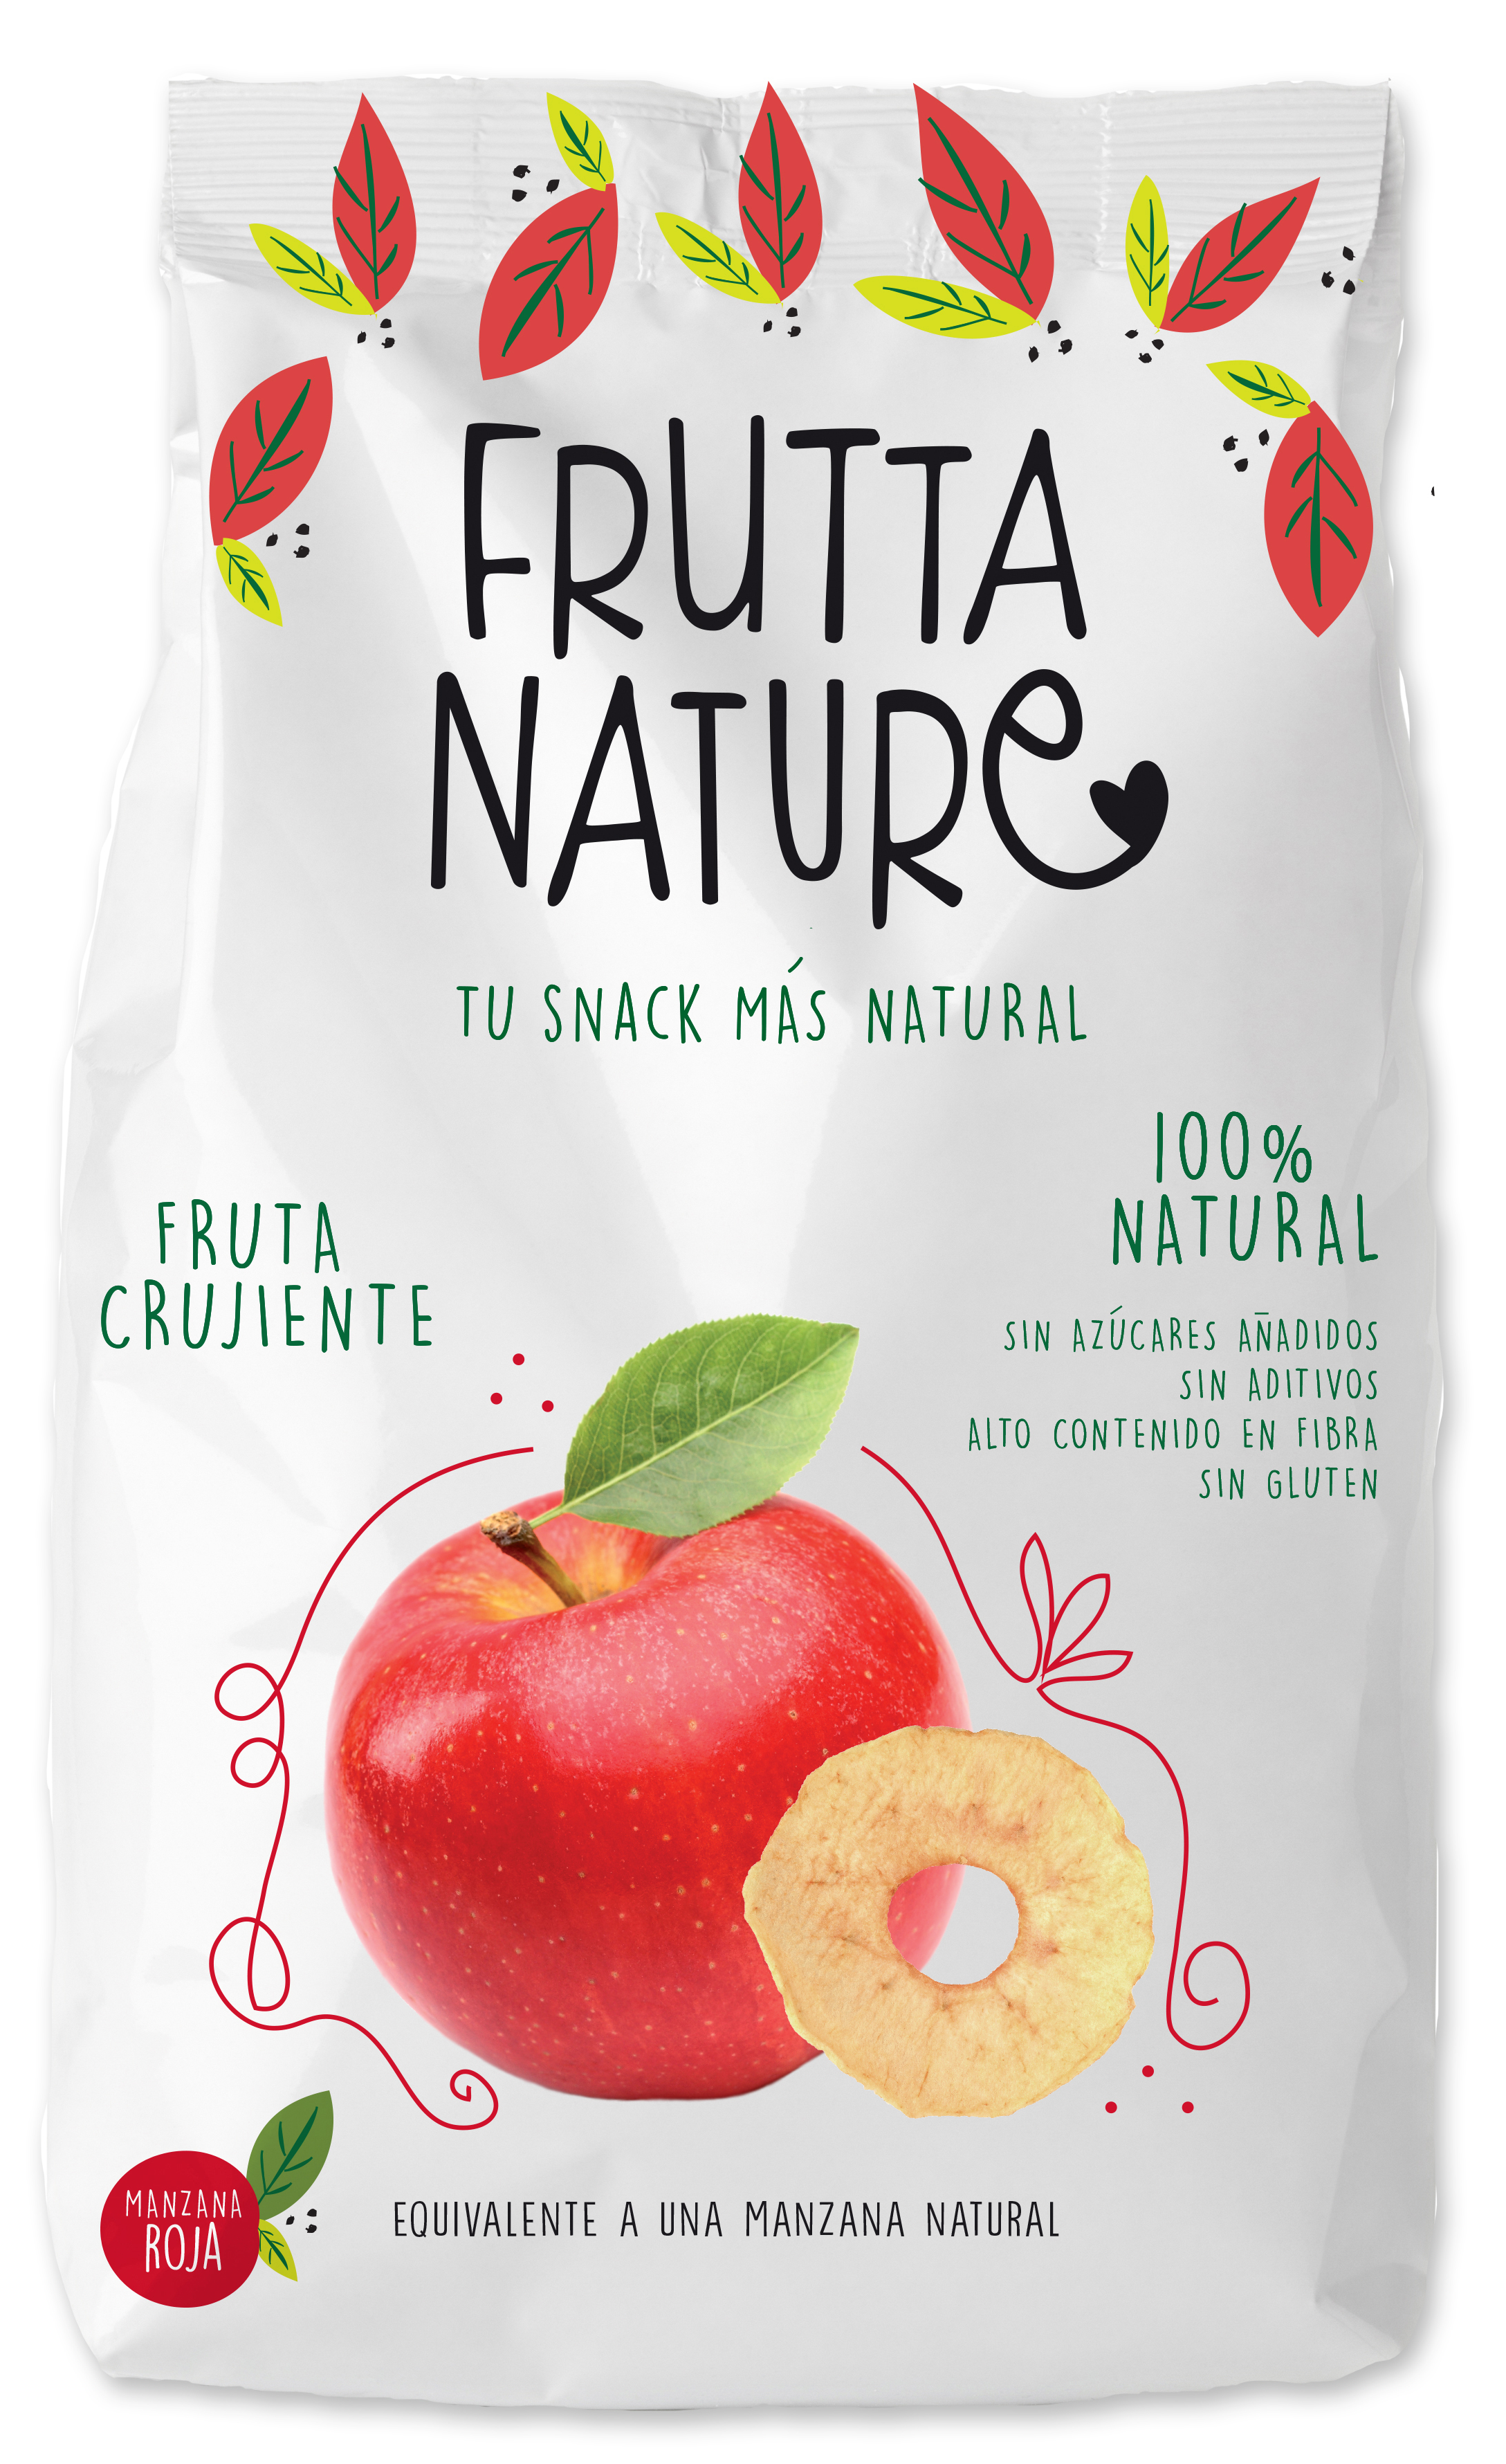 Frutta Nature Manzana Dulce